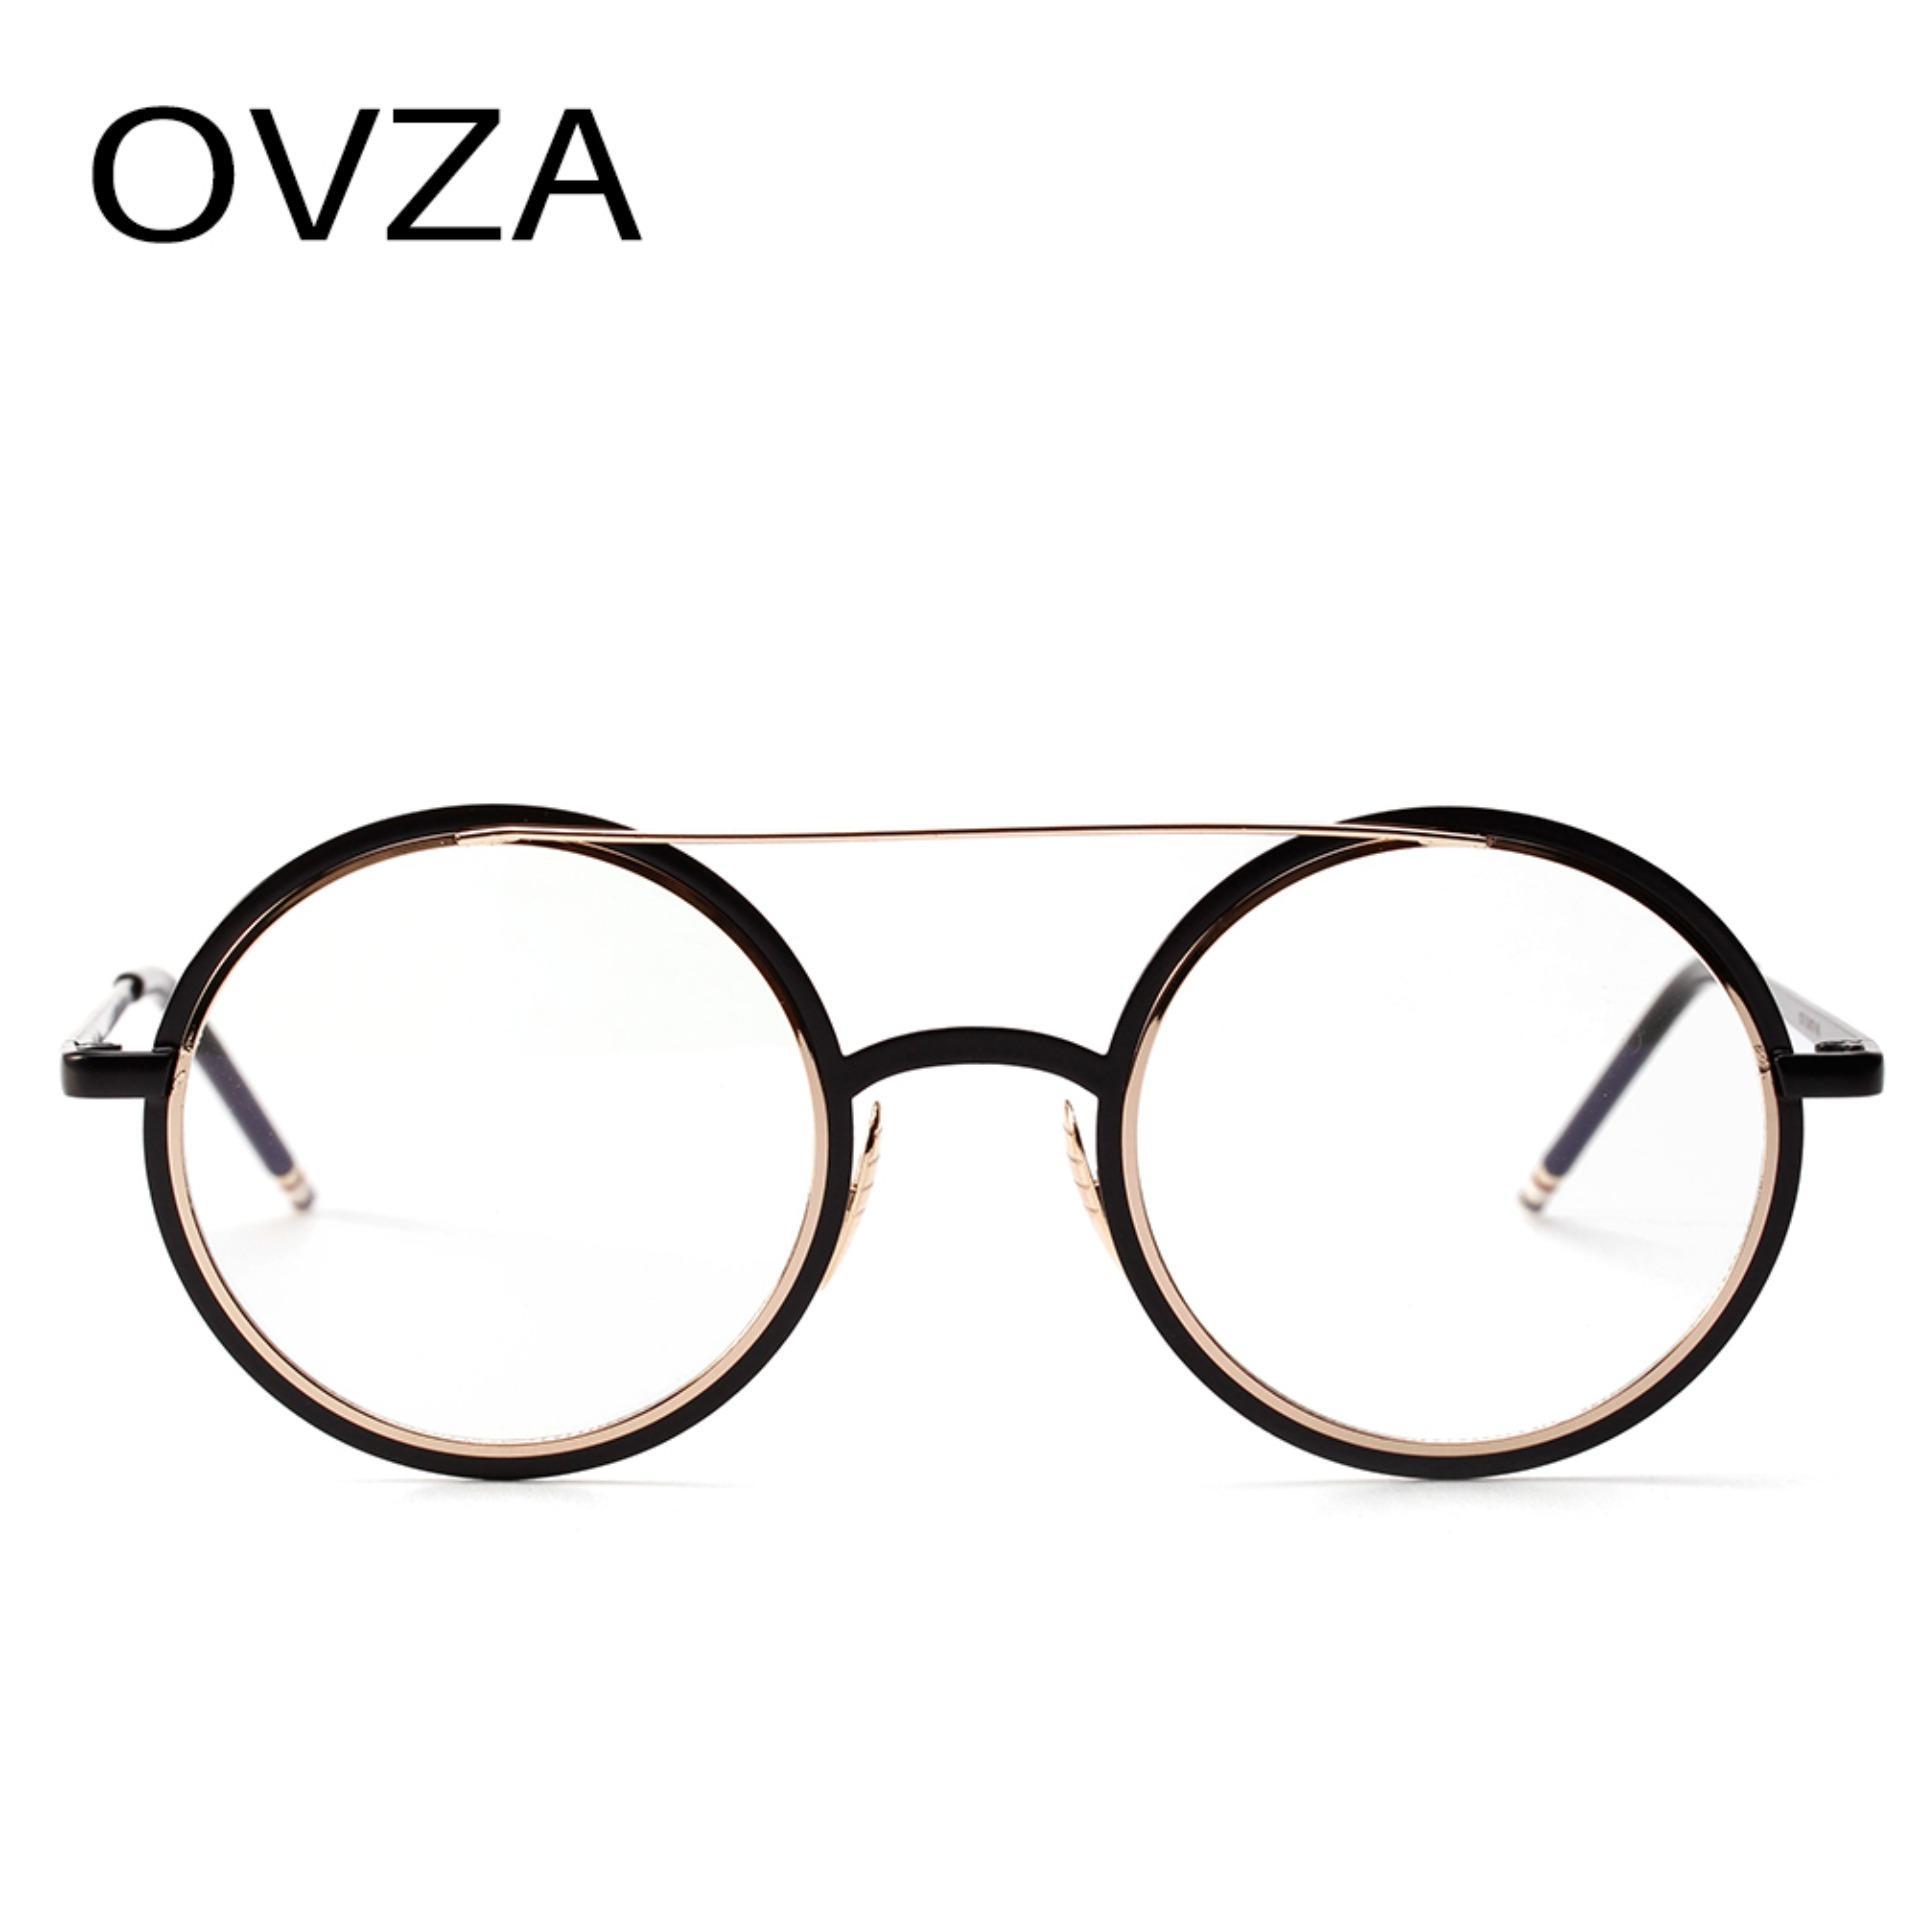 74ce4adab OVZA Fashion Round Optical Frame Women Retro Metal Eyeglasses Frames Men  Reading Glasses Frames - intl